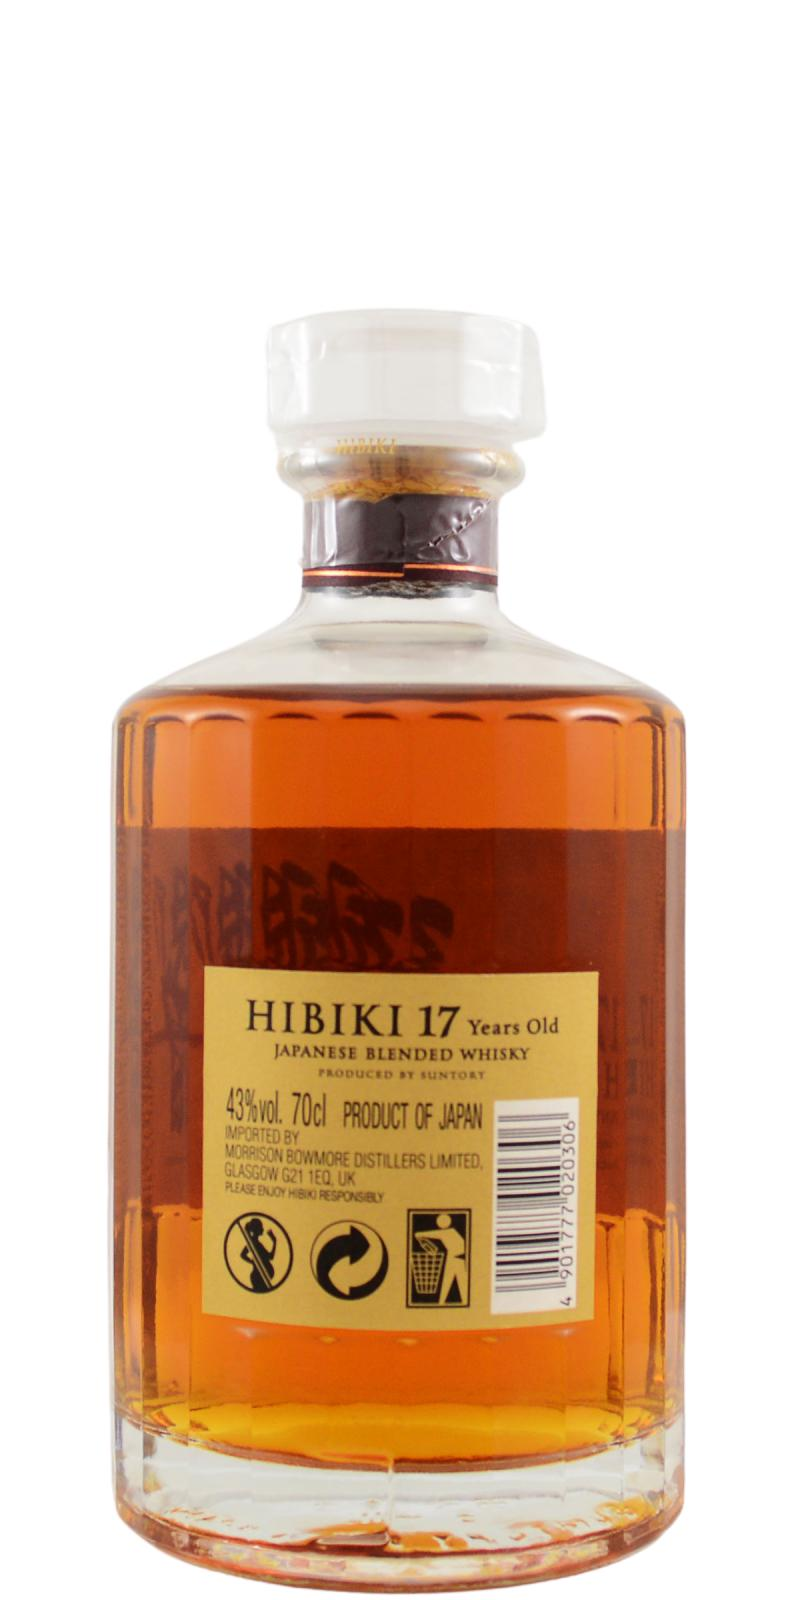 Hibiki 17-year-old